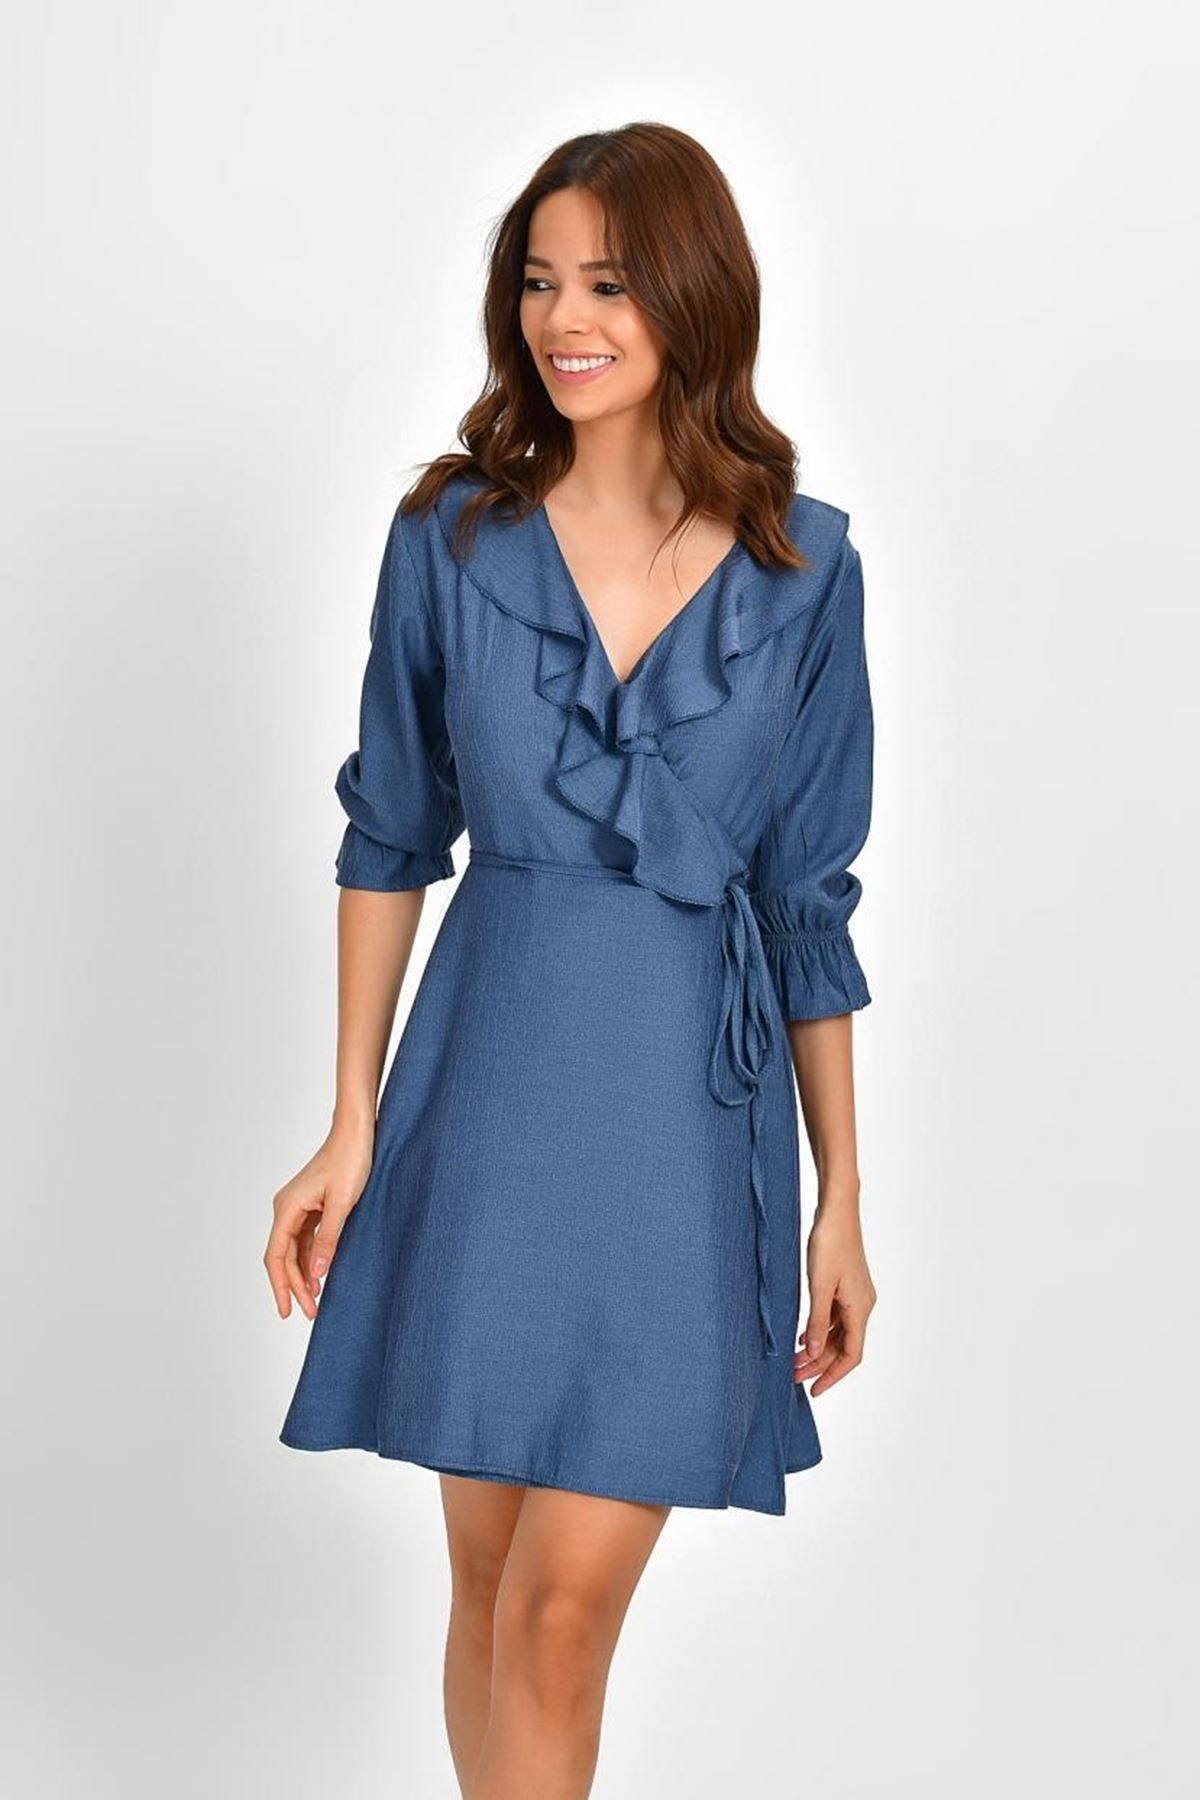 فستان ازرق كيوت كاجوال